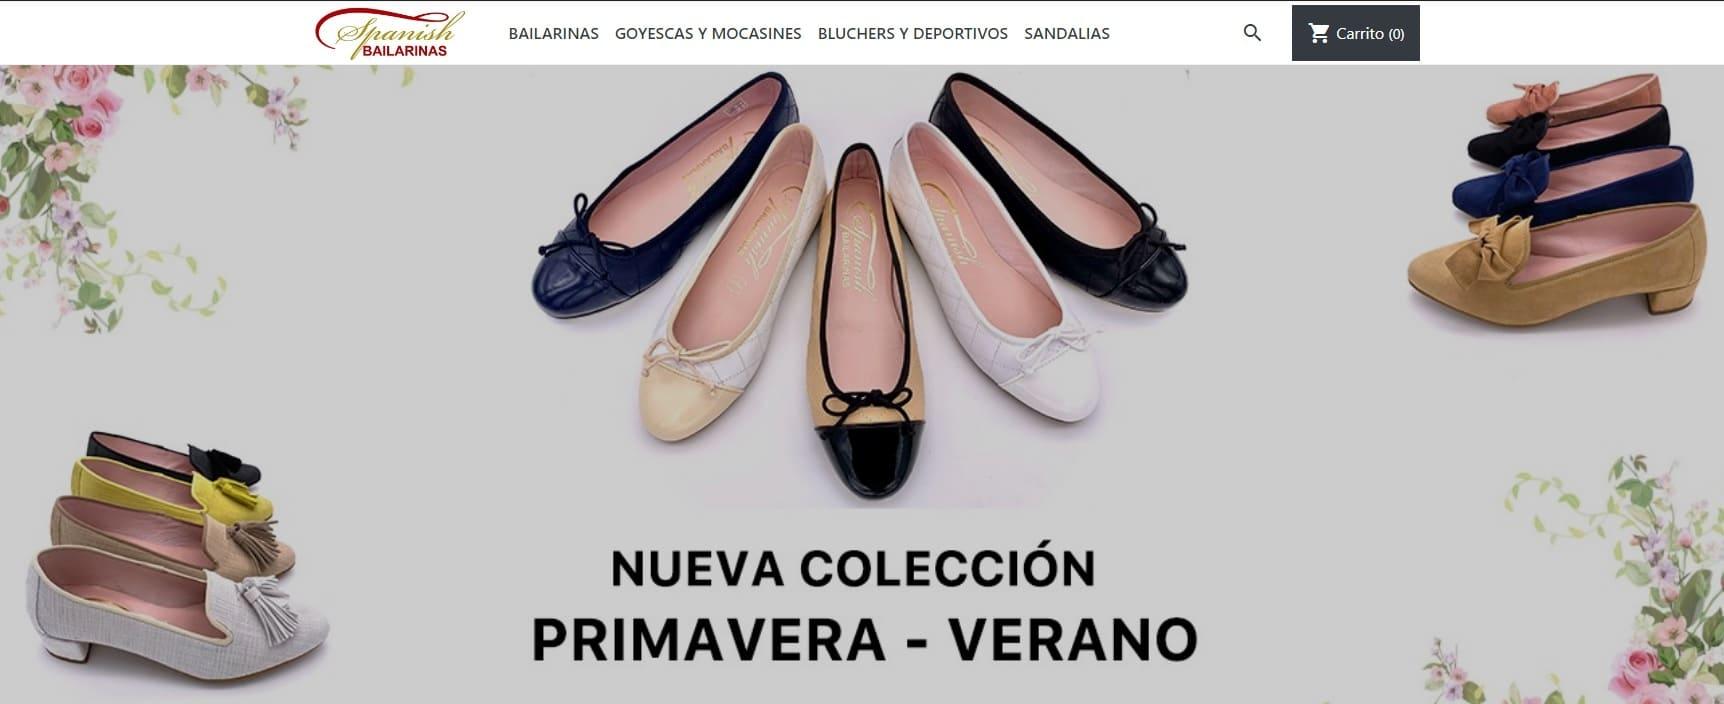 marcas-de-bailarinas-espanolas-Spanish-Bailarinas-tienda